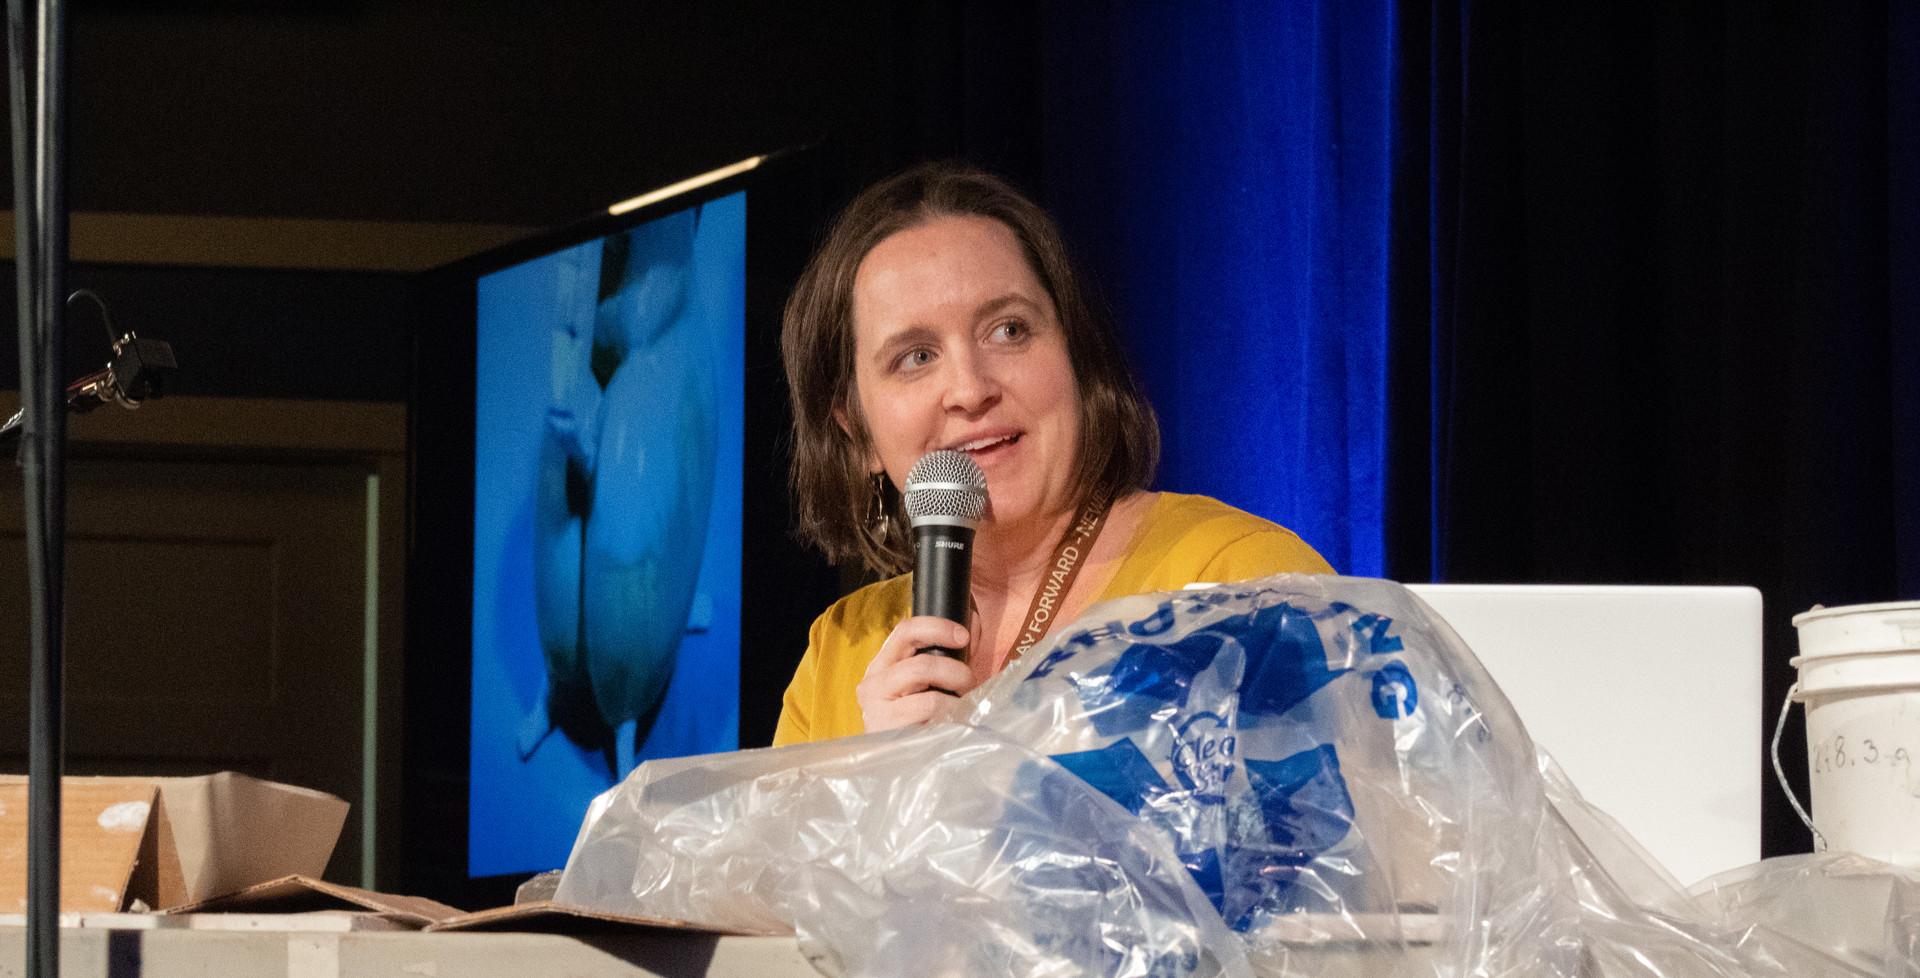 Kristin Schoonover